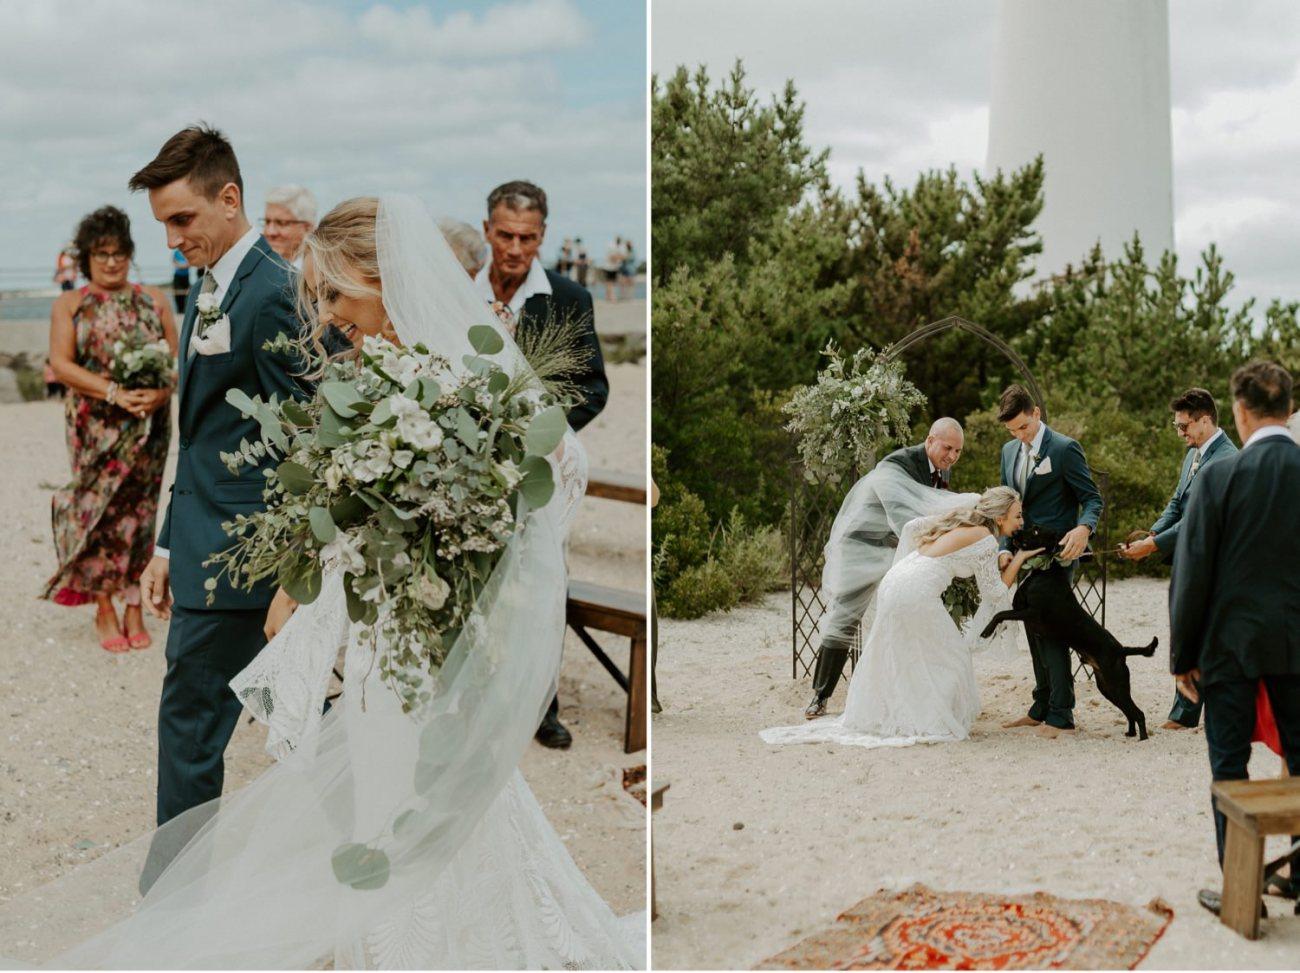 Long Beach Island Wedding Barnegat Lighthouse Wedding Ceremony New Jersey Wedding Anais Possamai Photography Oregon Wedding Photographer 0031